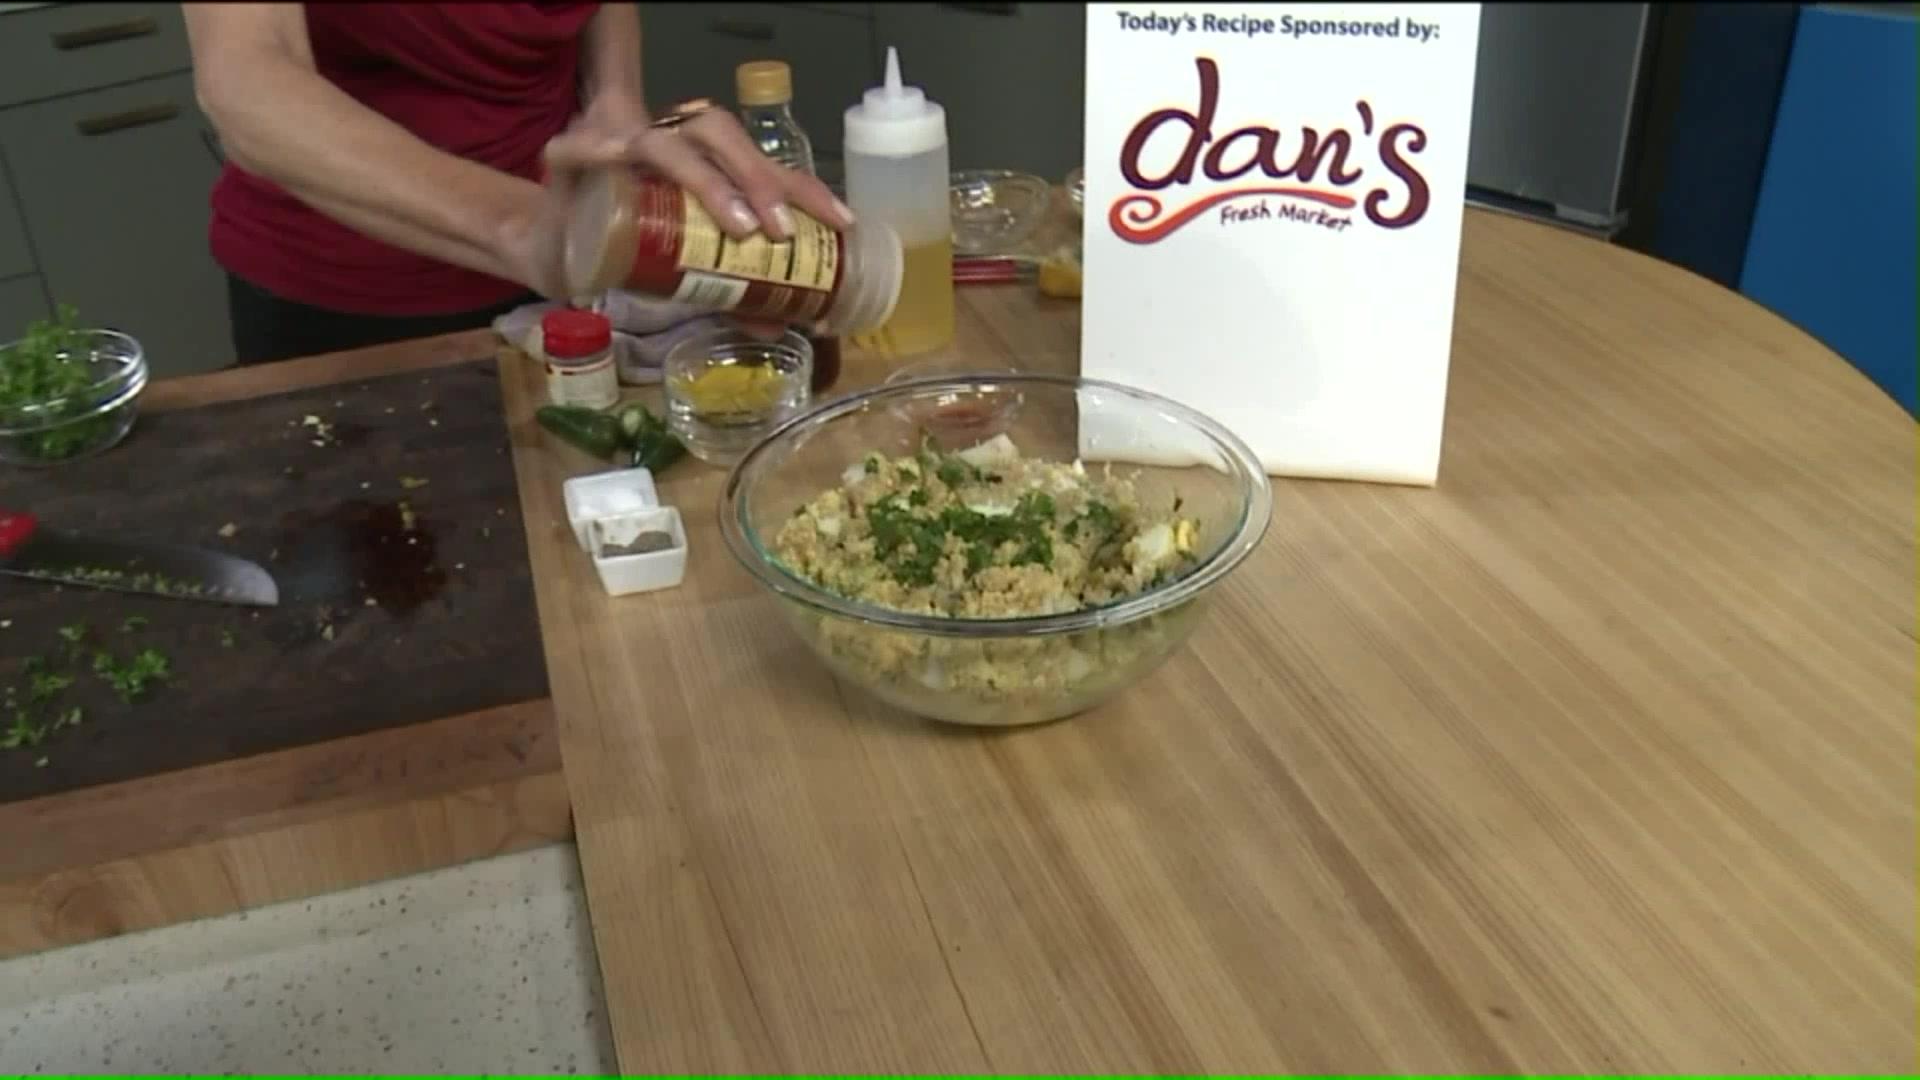 How To Make a Kicked-Up Quinoa Salad